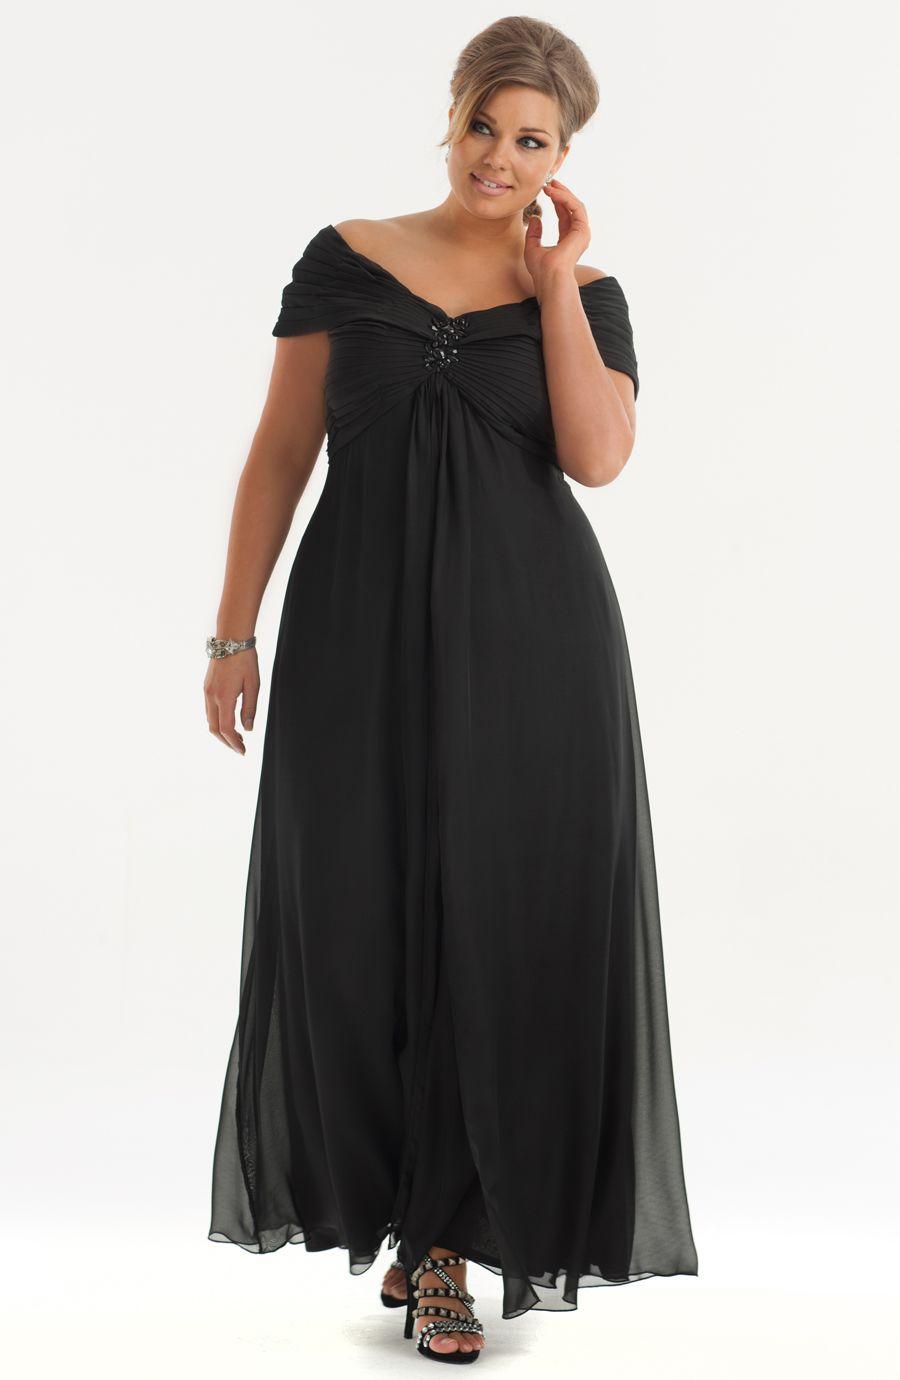 164939d18 32 Stunning Plus Size Evening Gown Ideas. Vestidos Largos Para ...